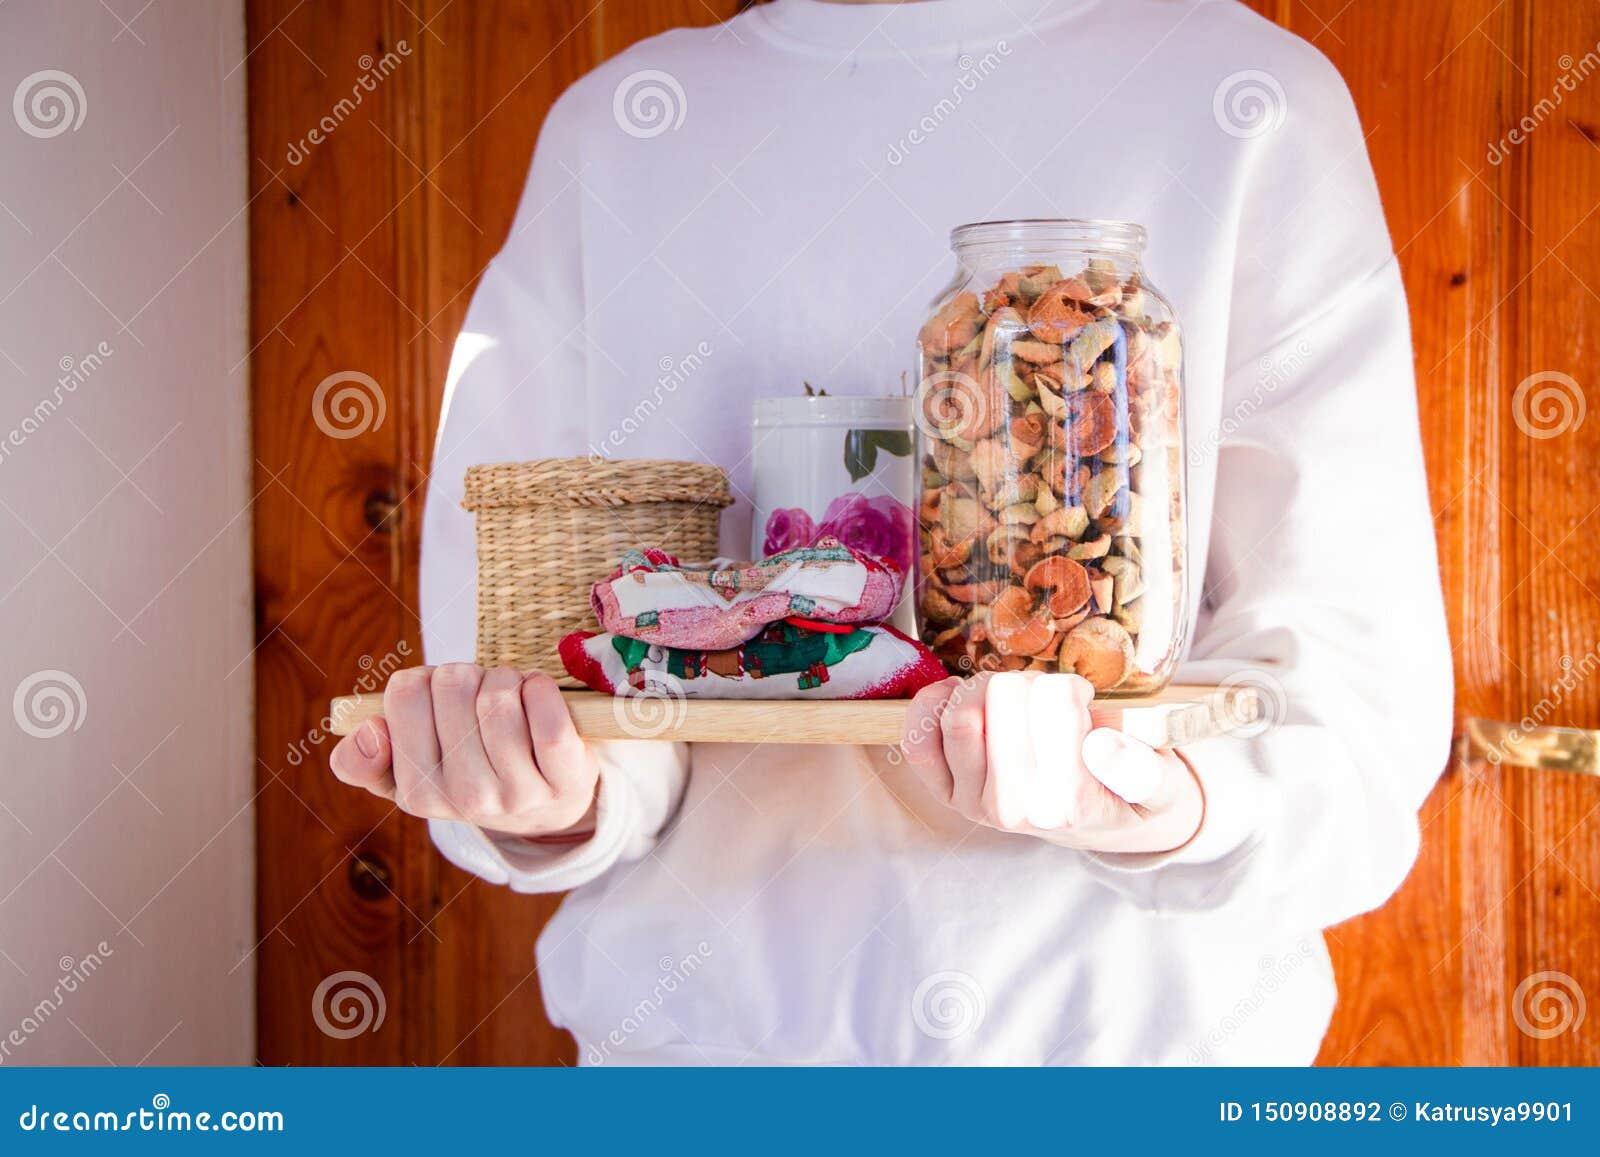 Ecological alternatives to plastics